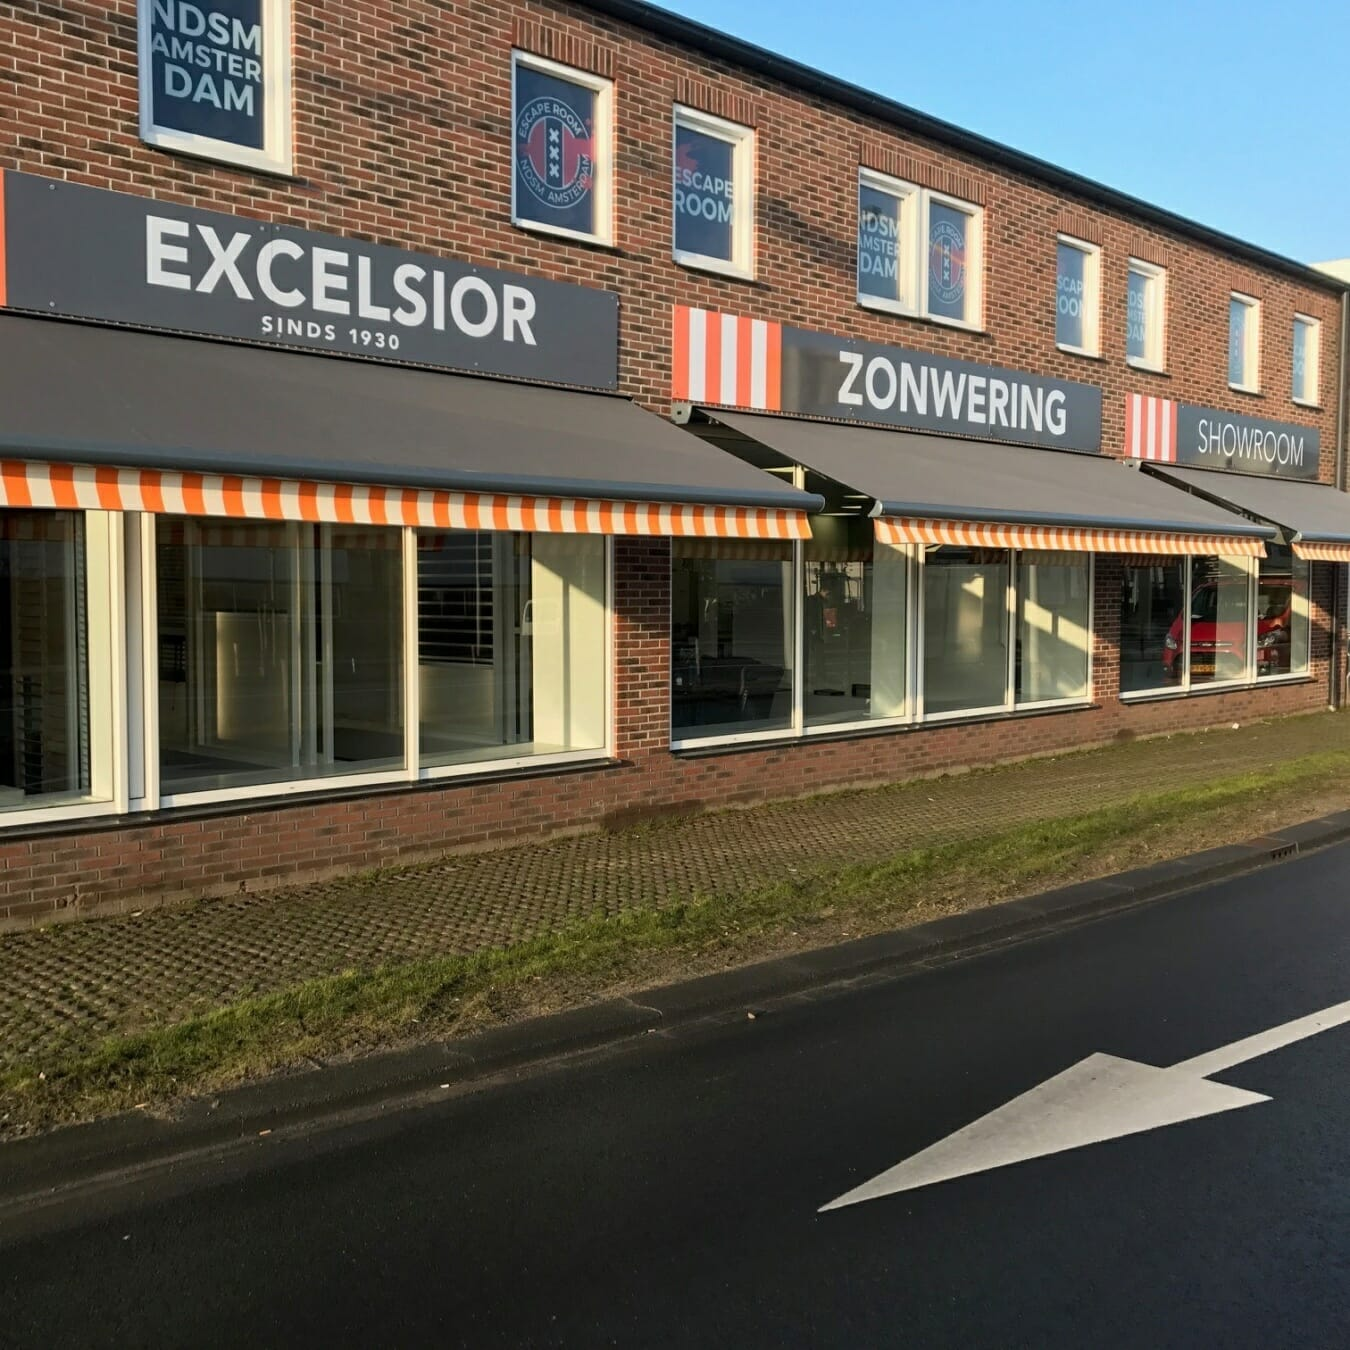 Excelsior Zonwering - winkelpand